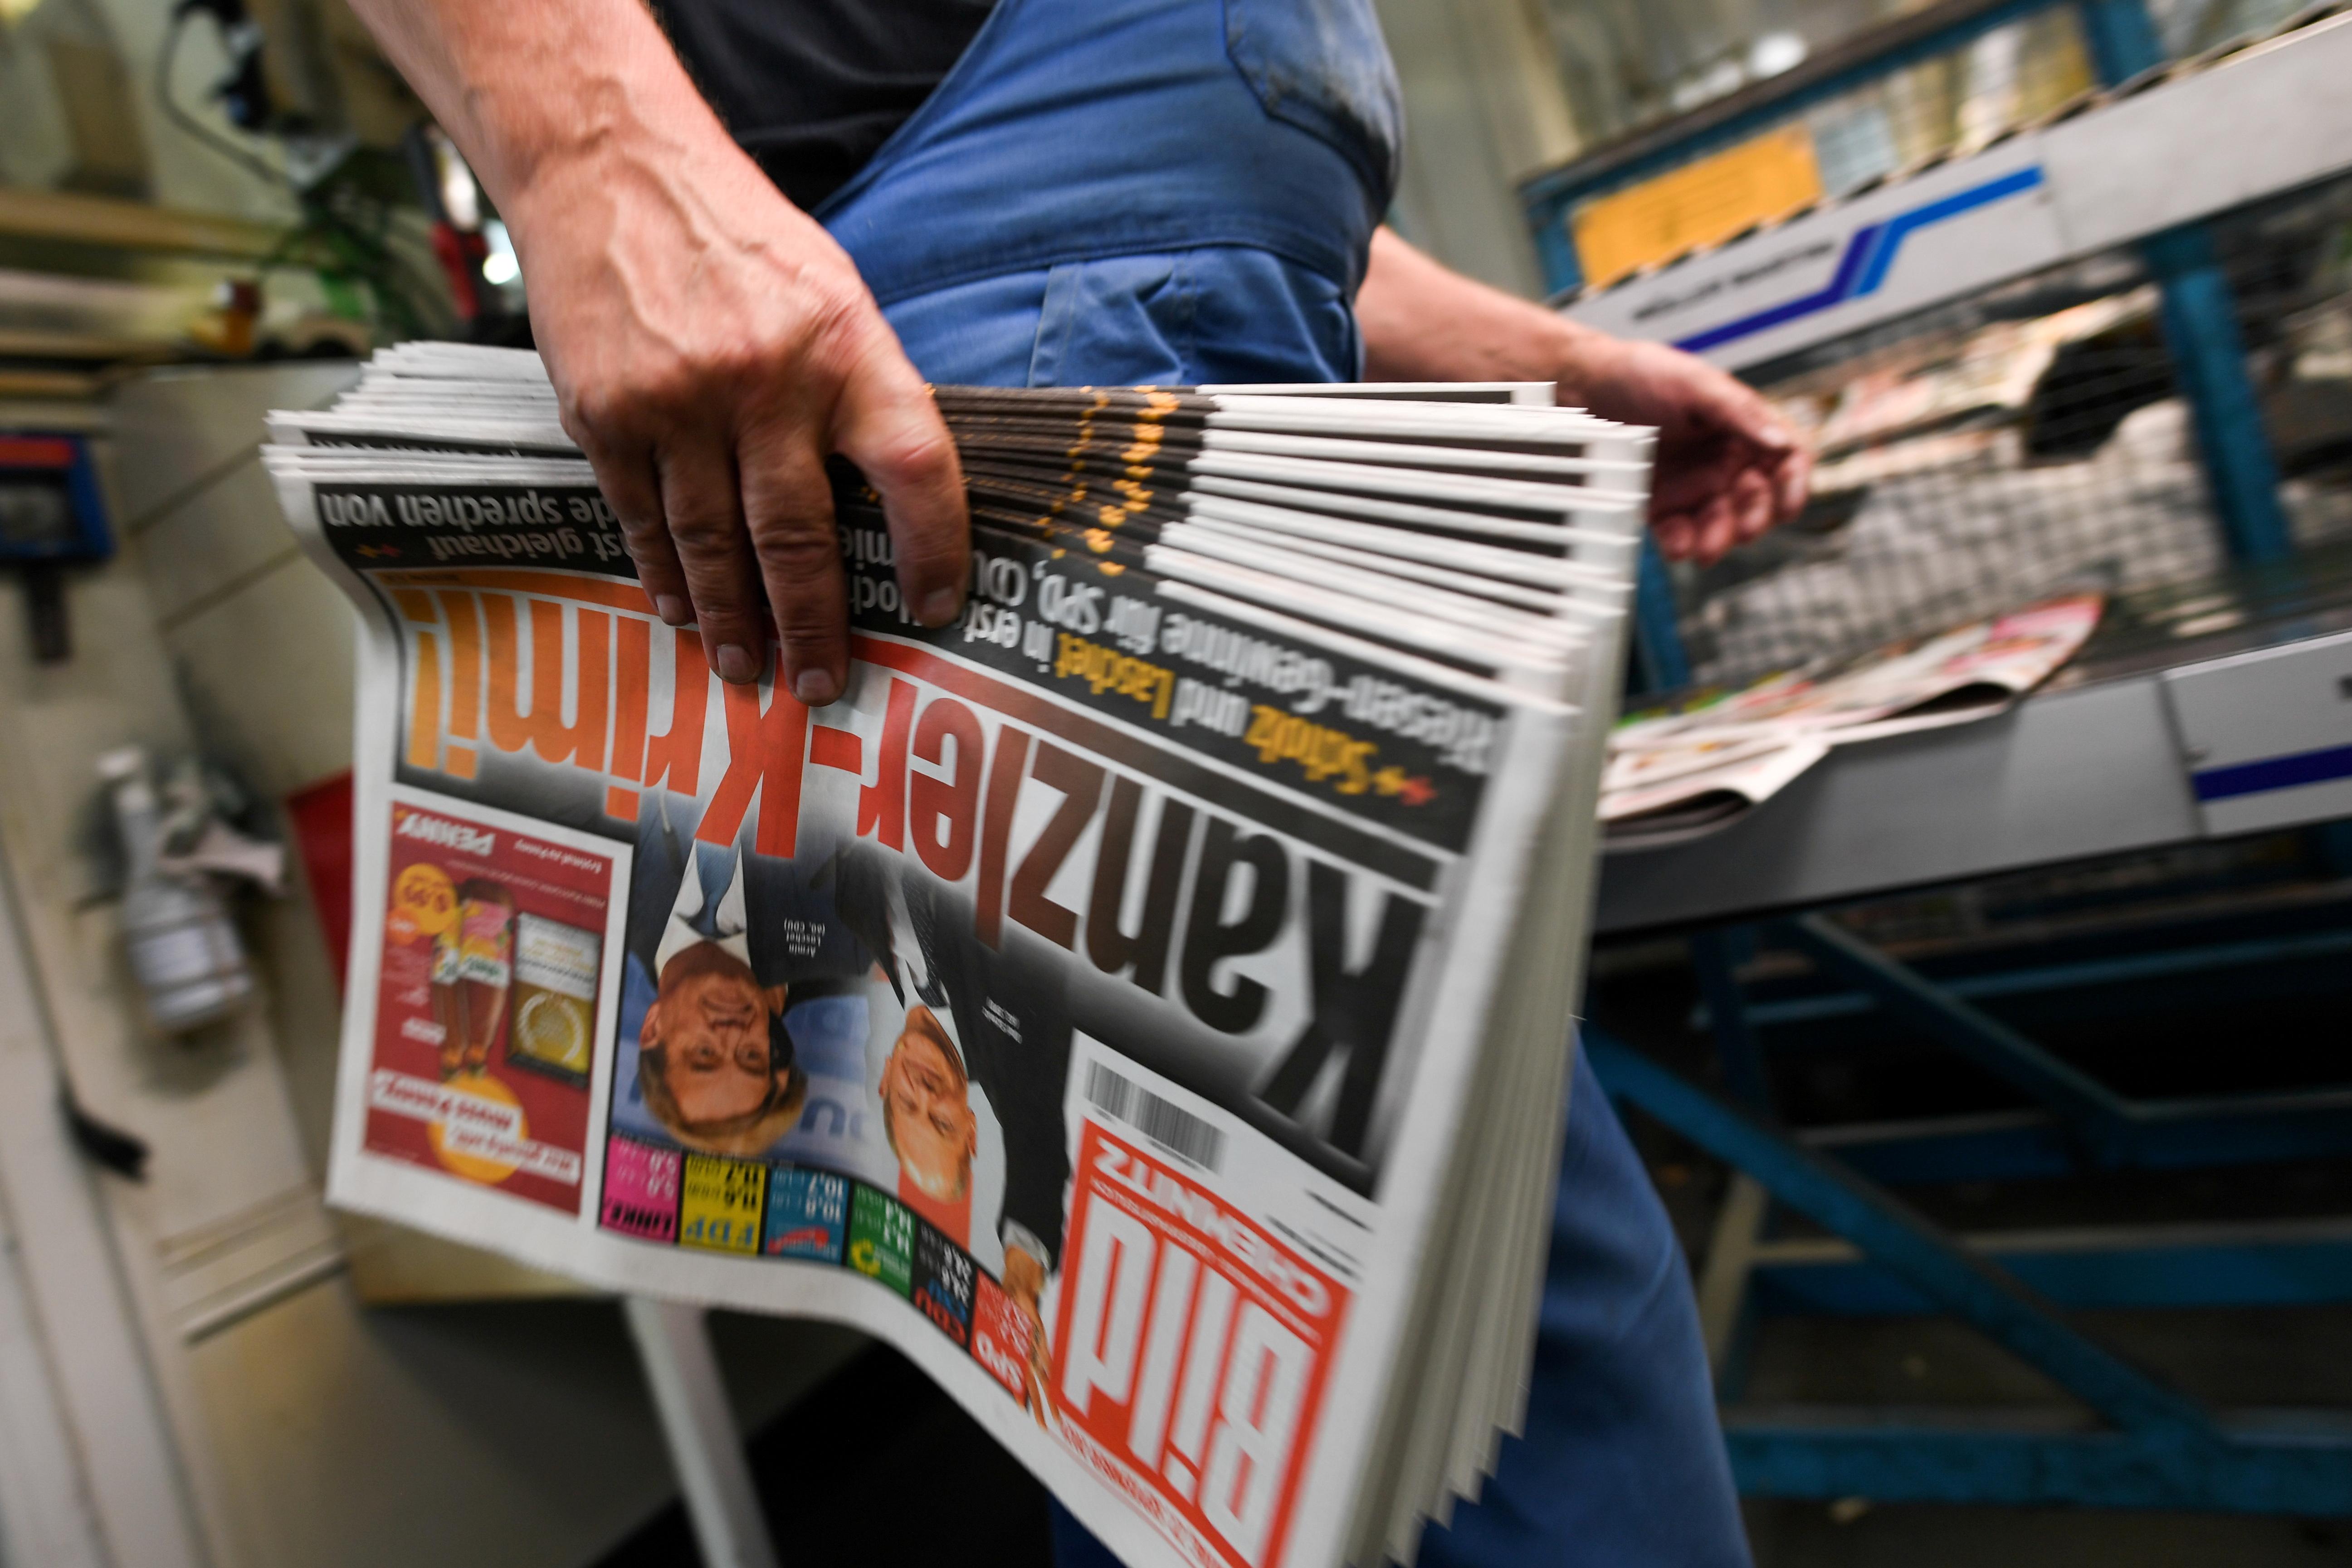 Germany's Axel Springer fires top Bild editor after media report